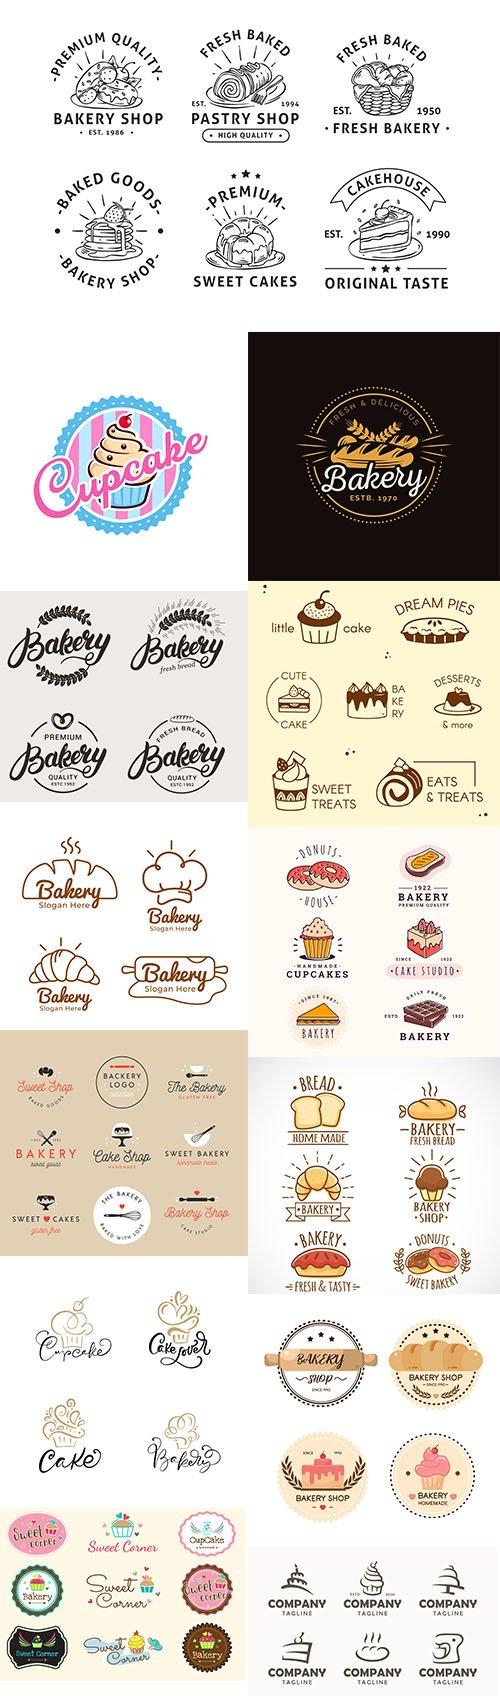 Bakery cake logo template collection vol 3